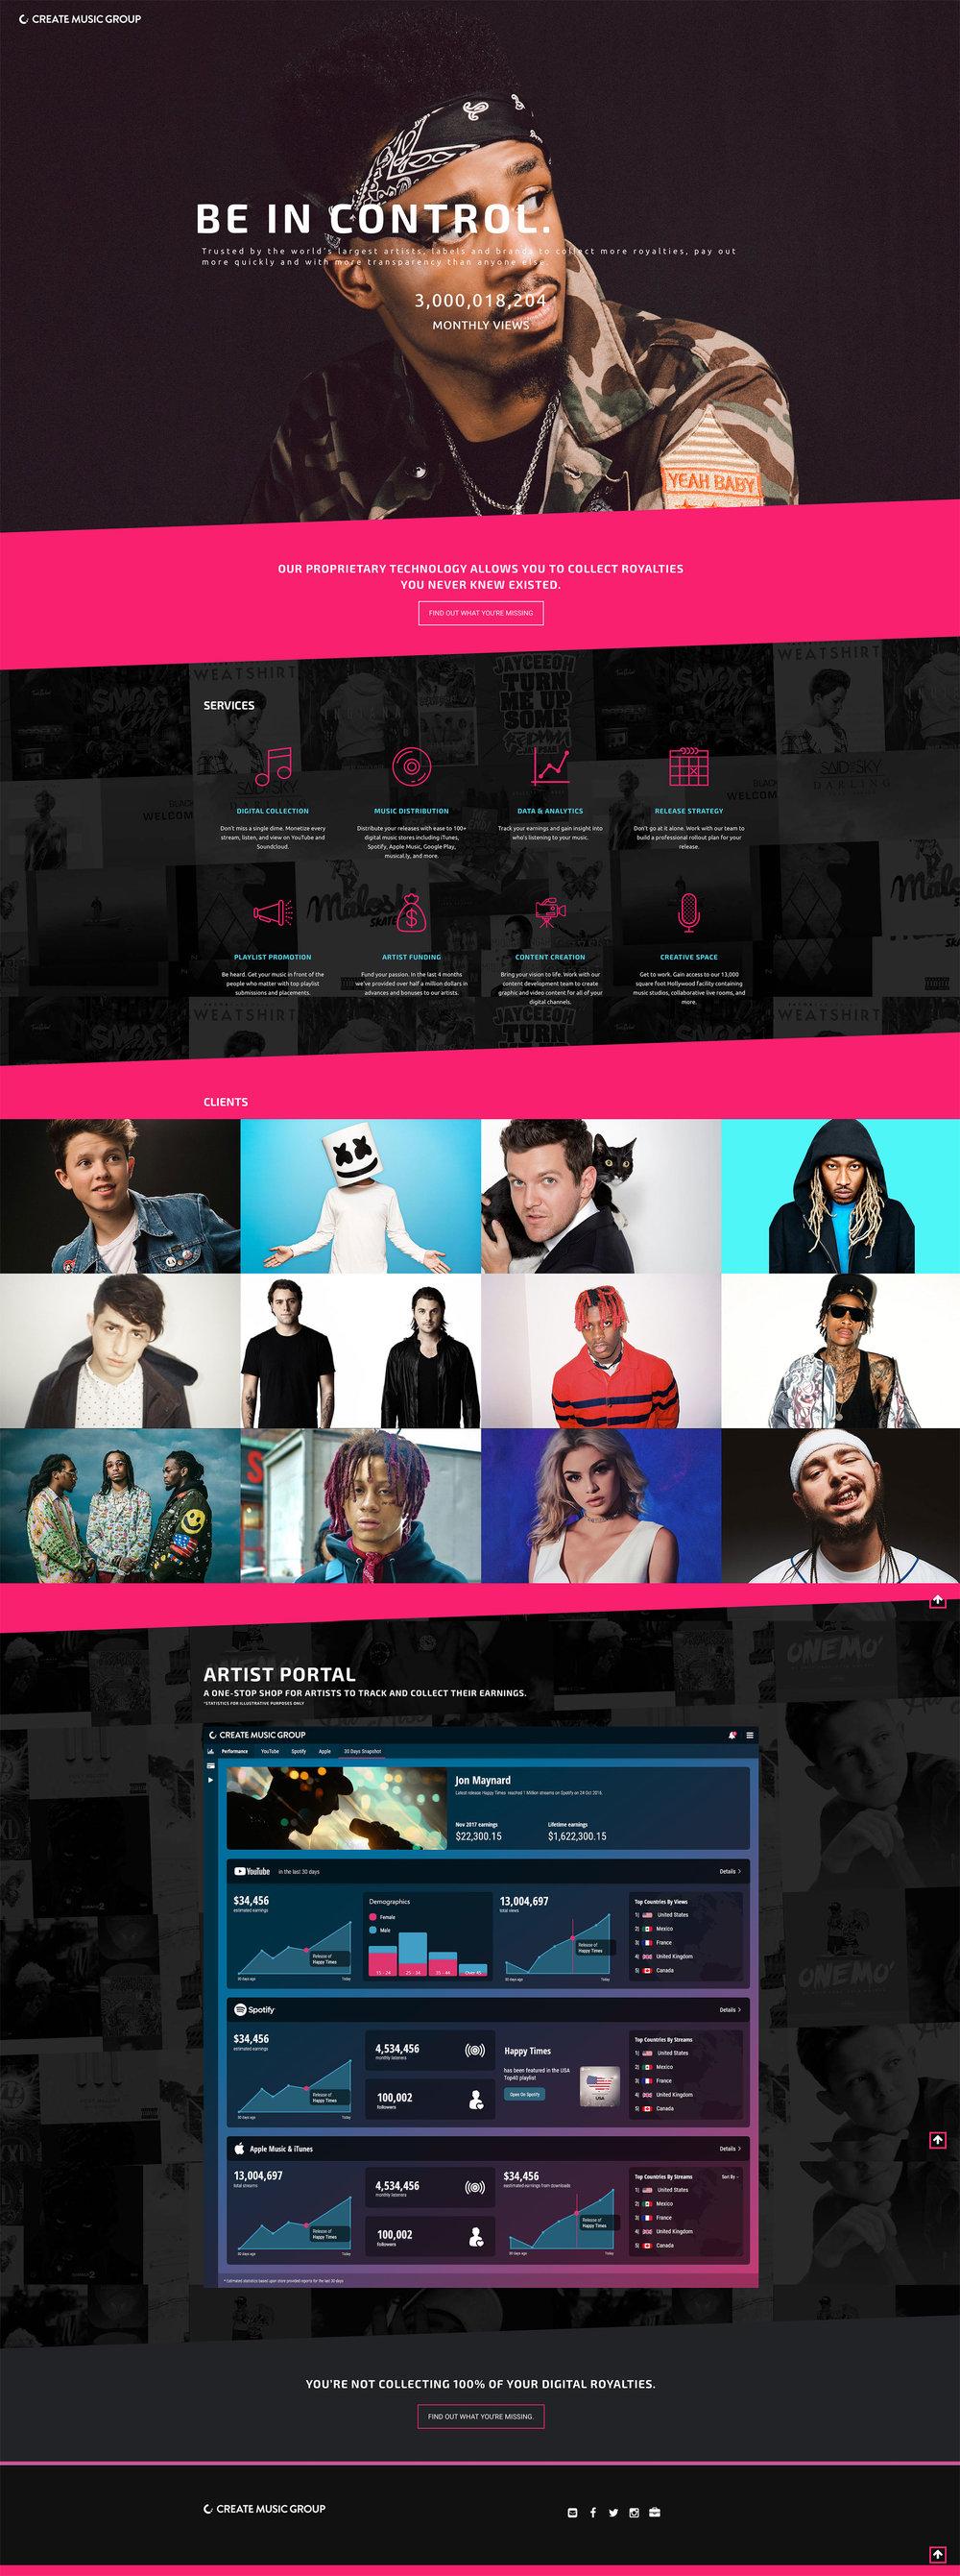 Create Music Group - Website Re-design